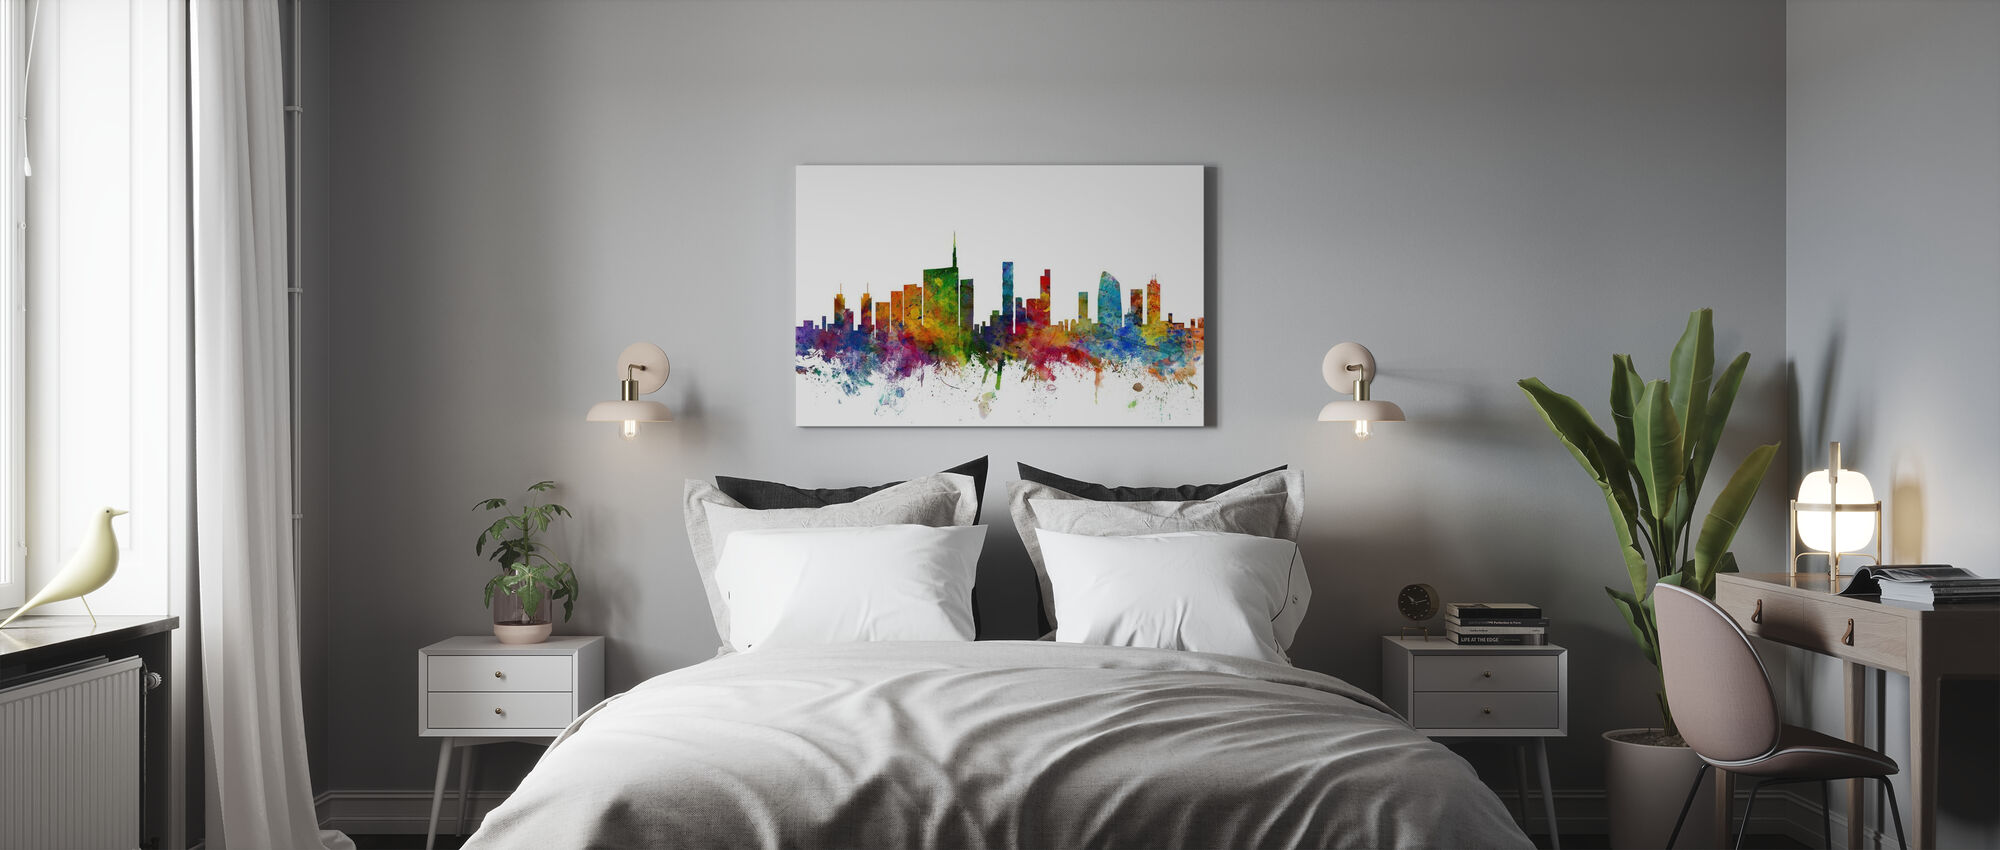 Milan Skyline - Canvas print - Bedroom